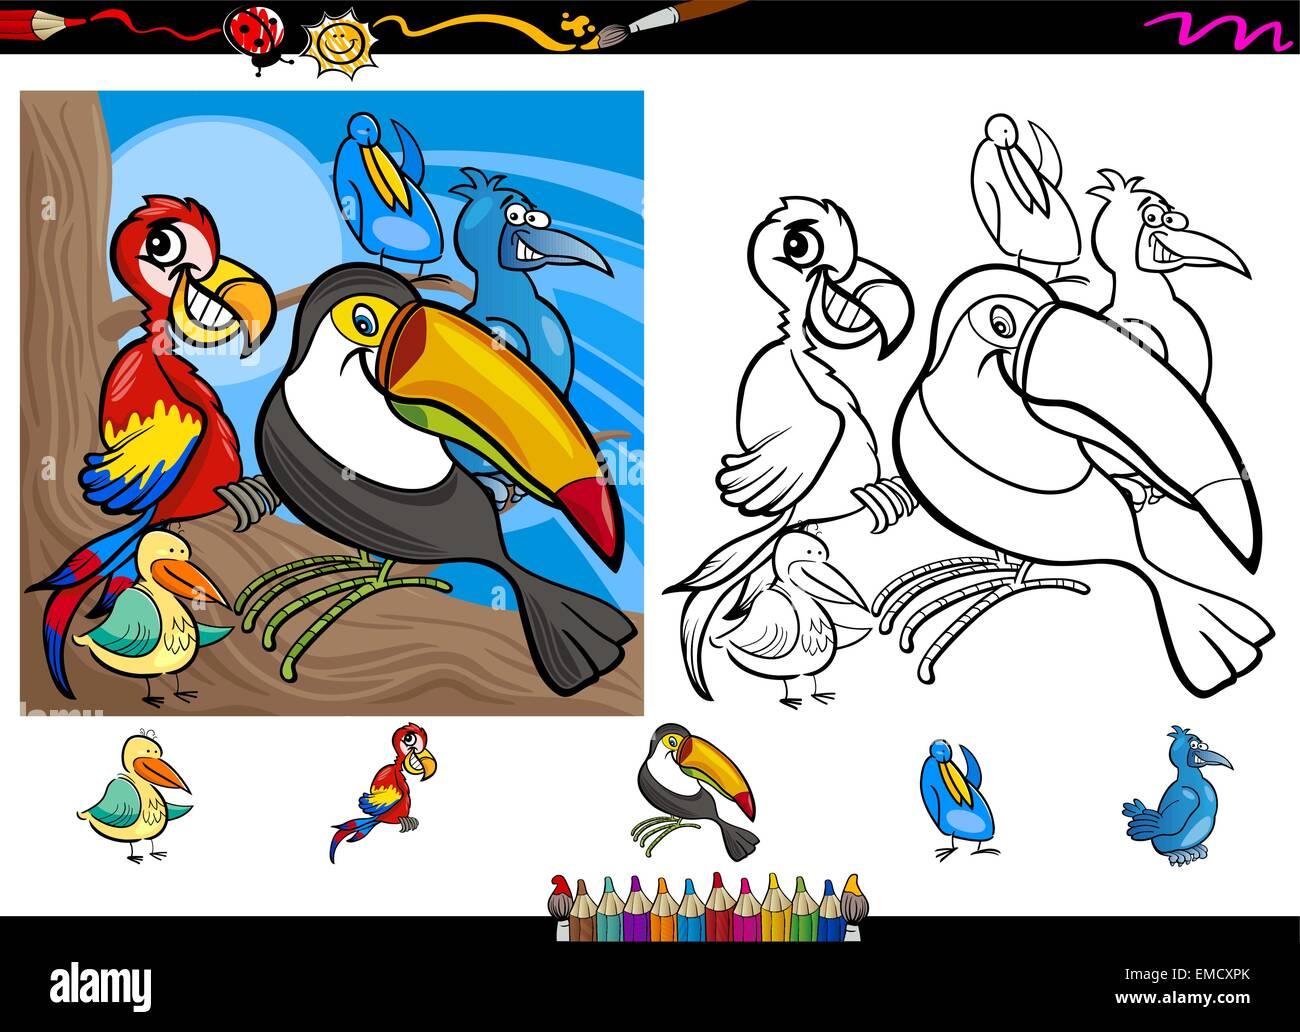 Illustrations Toucan Stockfotos & Illustrations Toucan Bilder - Alamy